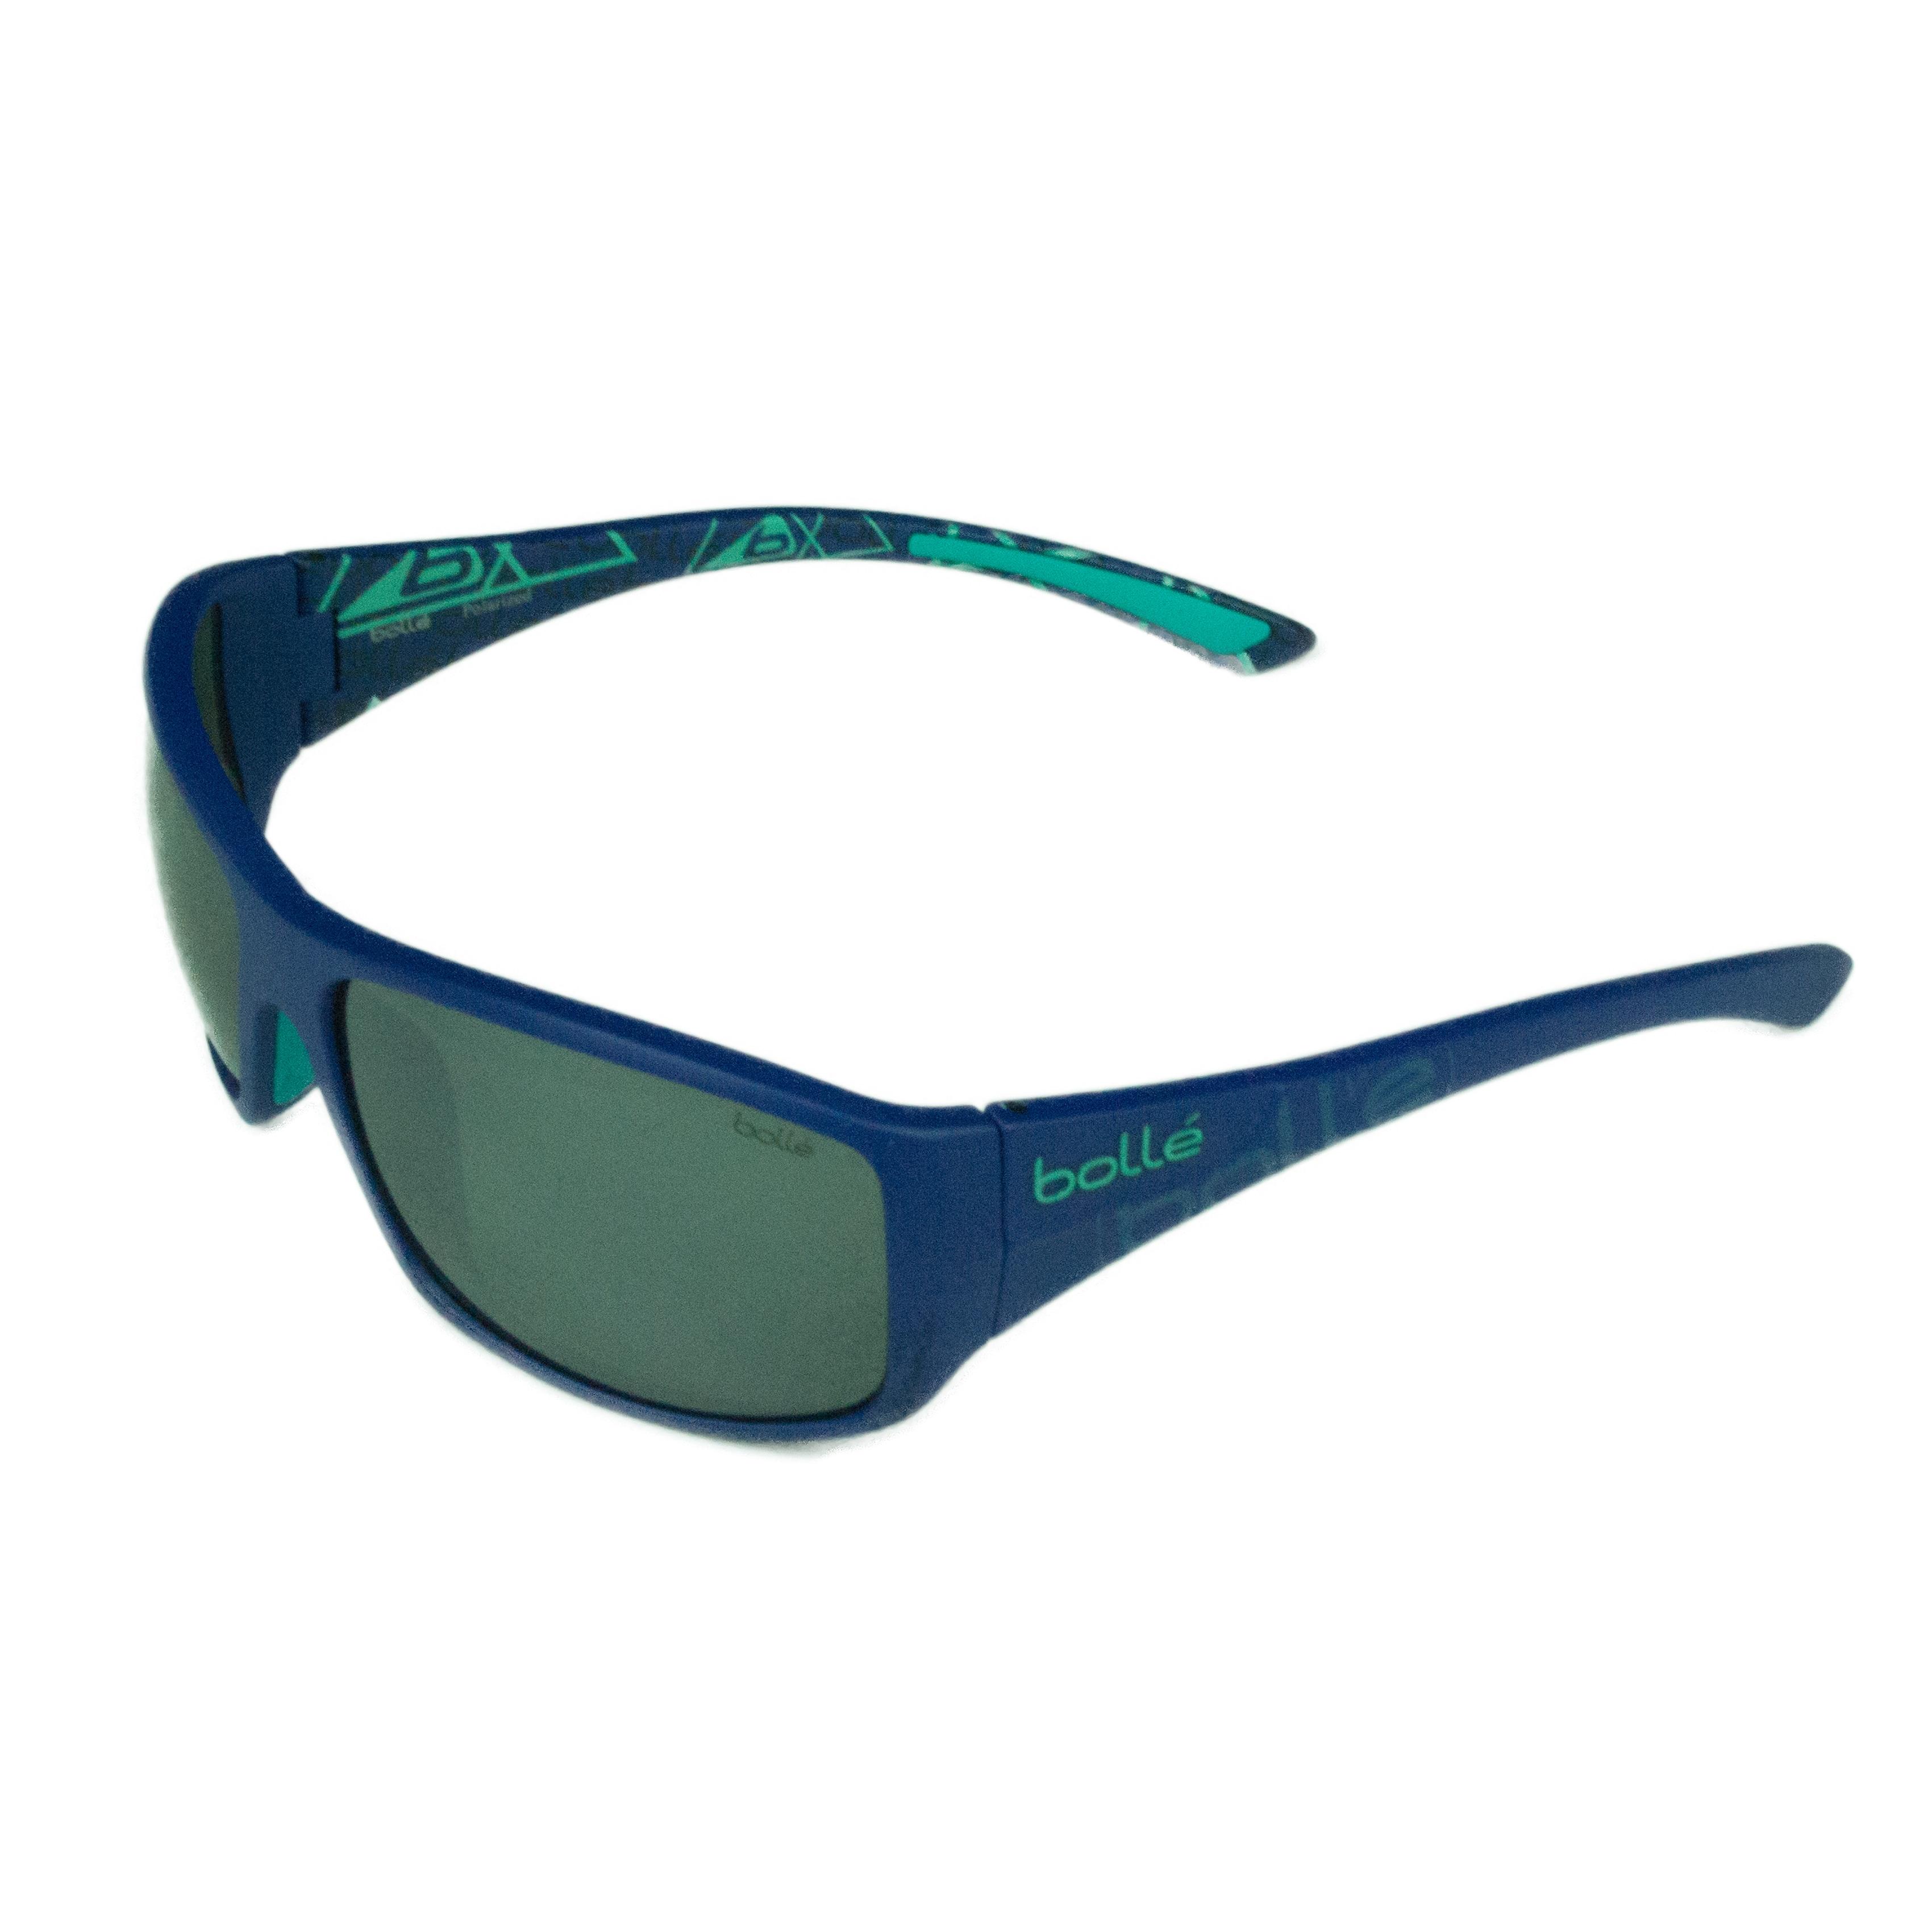 7e068283c45fb Shop Bolle Sport Unisex Kingsnake Sunglasses - 12122 - Free Shipping Today  - Overstock - 18228927